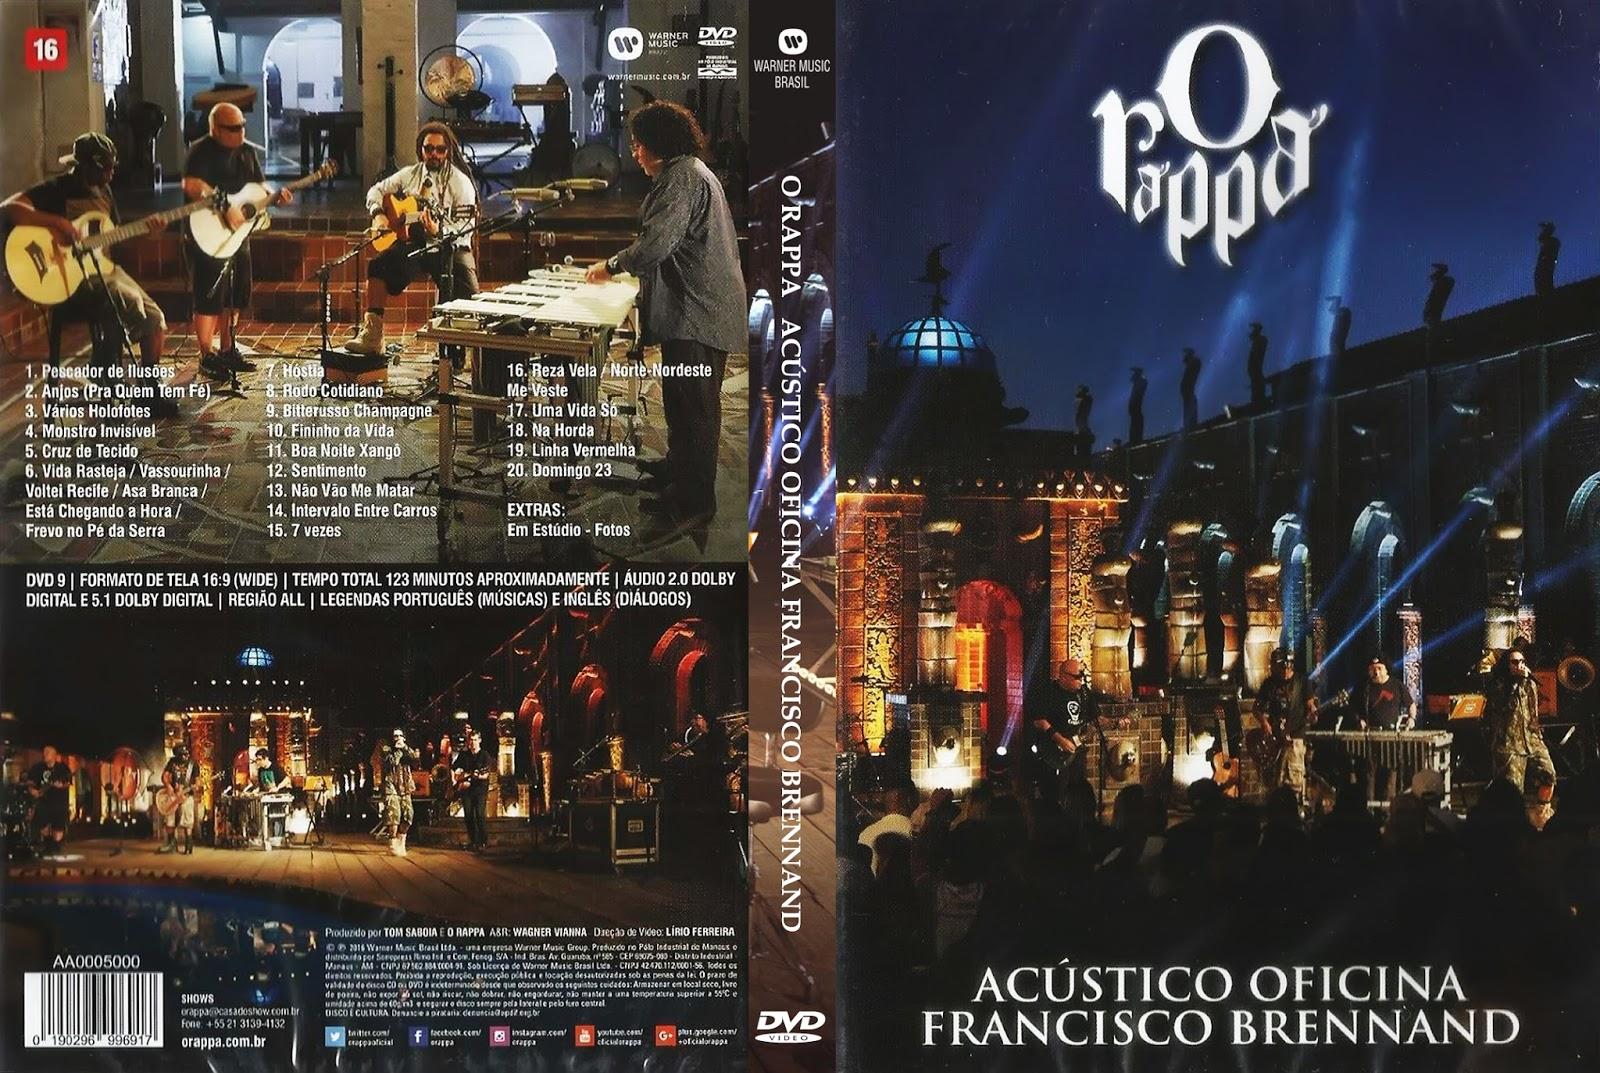 Download O Rappa Acústico Oficina Francisco Brennand DVD-R O 2BRappa 2B  2BAc 25C3 25BAstico 2BOficina 2BFrancisco 2BBrennand 2B 25282016 2529 2BOficial